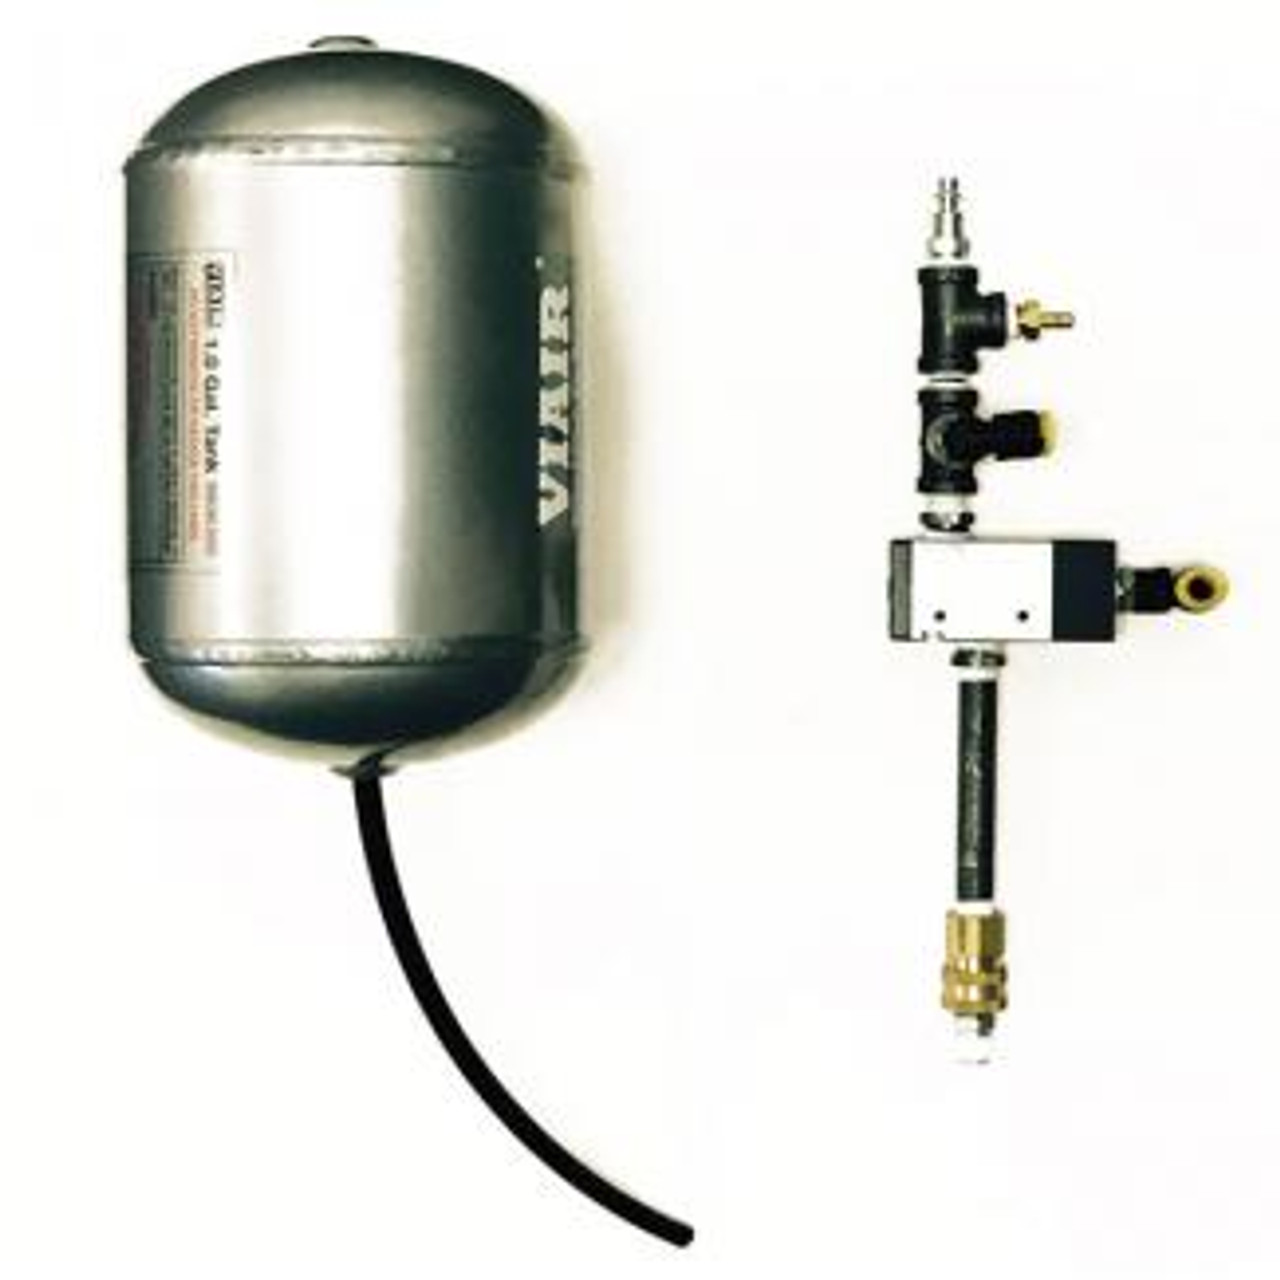 Clicker 1500 Air Accumulator